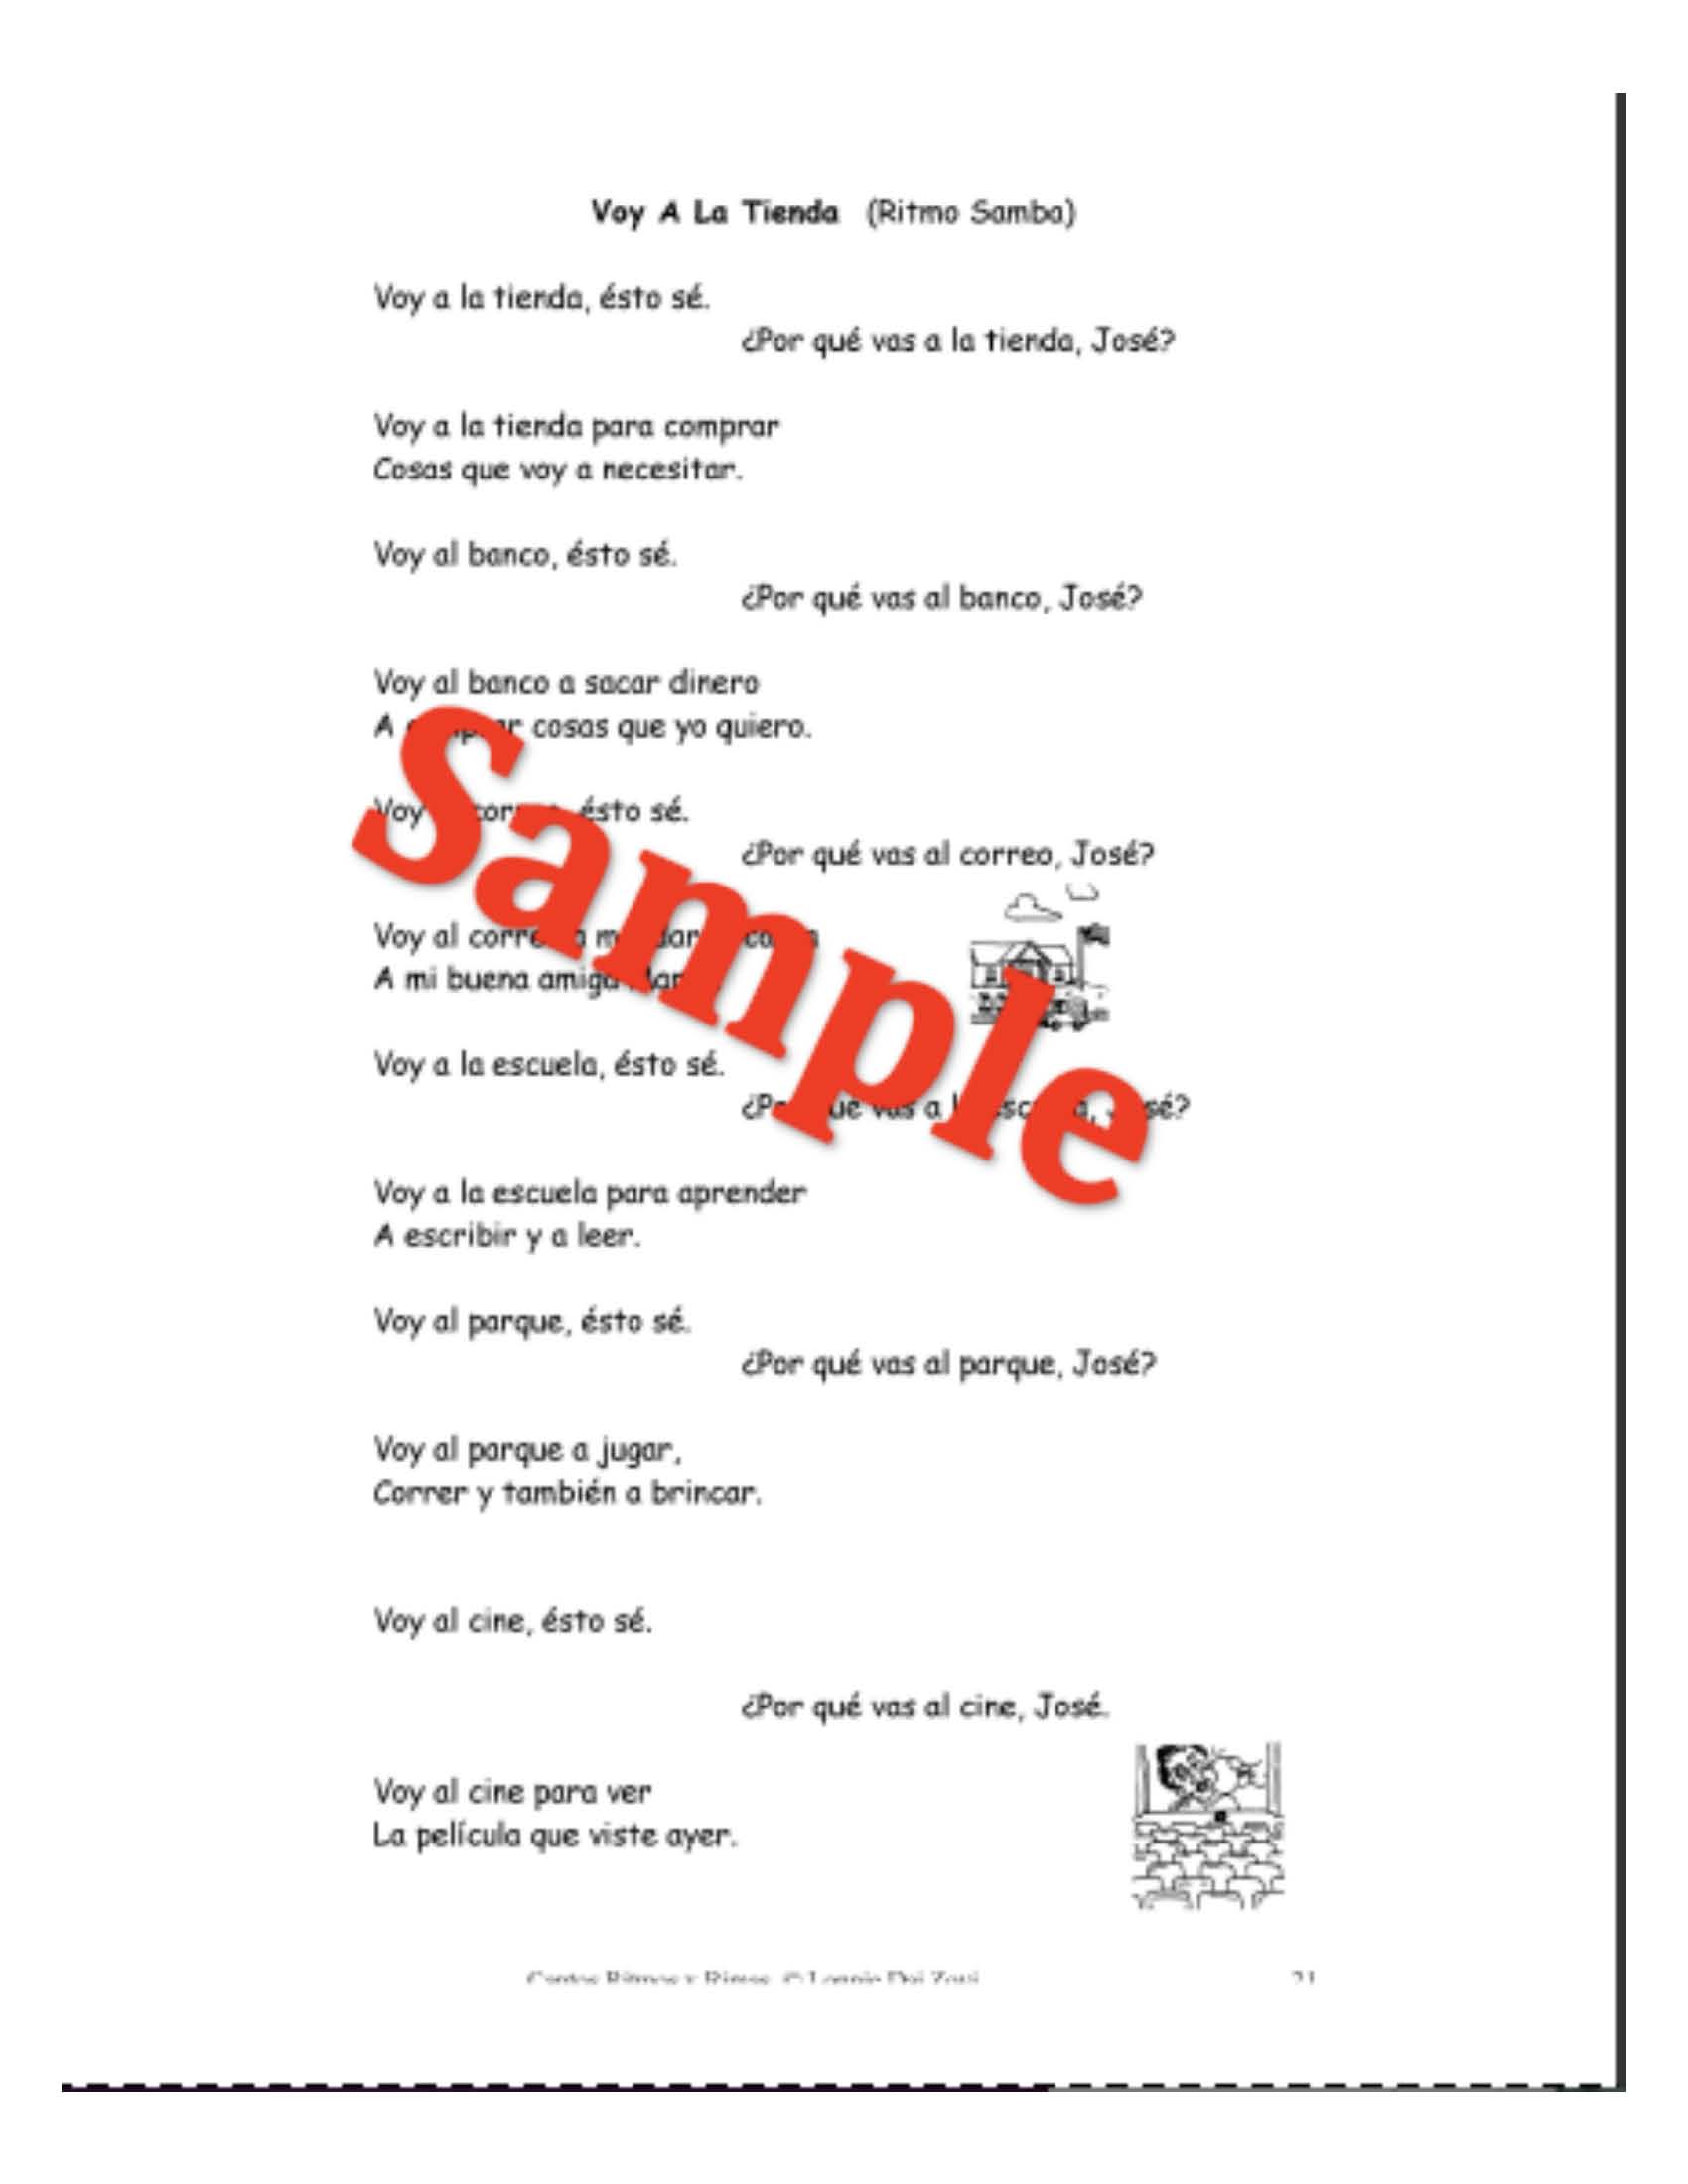 Cantos_samples 2